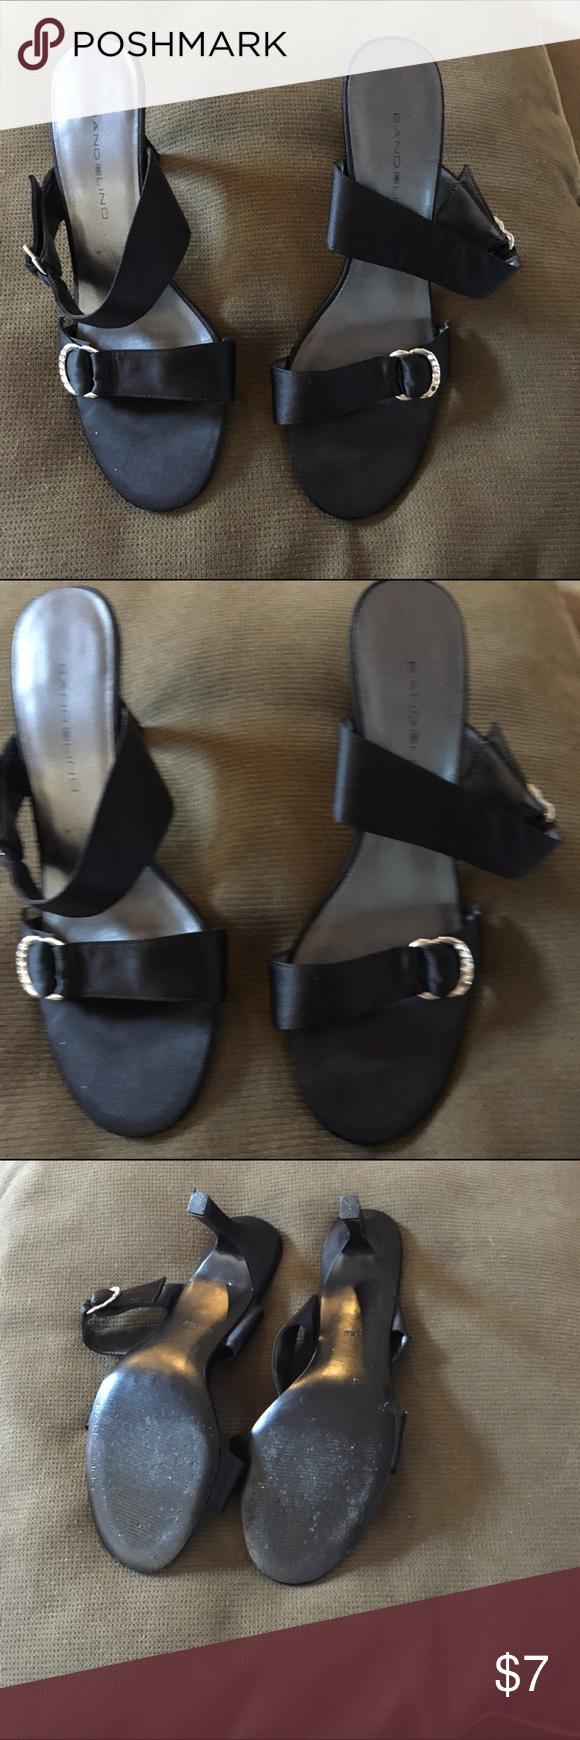 Black sandals 2 inch heel - Black Sandals 2 Inch Heel 36